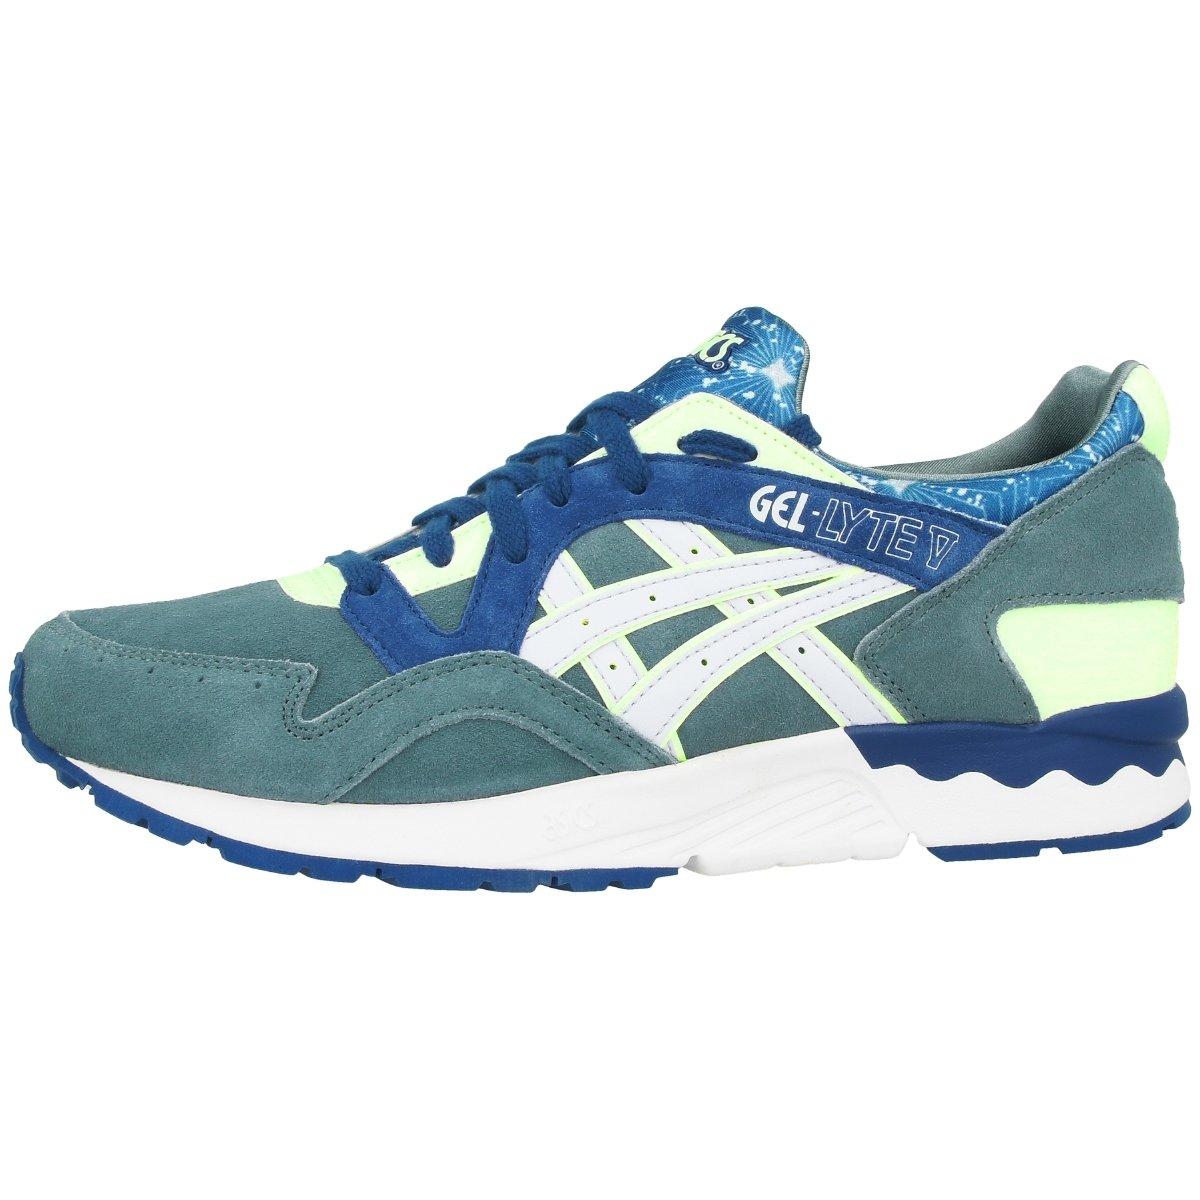 hot sale online e61d4 8826c Asics Gel-Lyte V Schuhe goblin blue-plein air - 43: Amazon ...